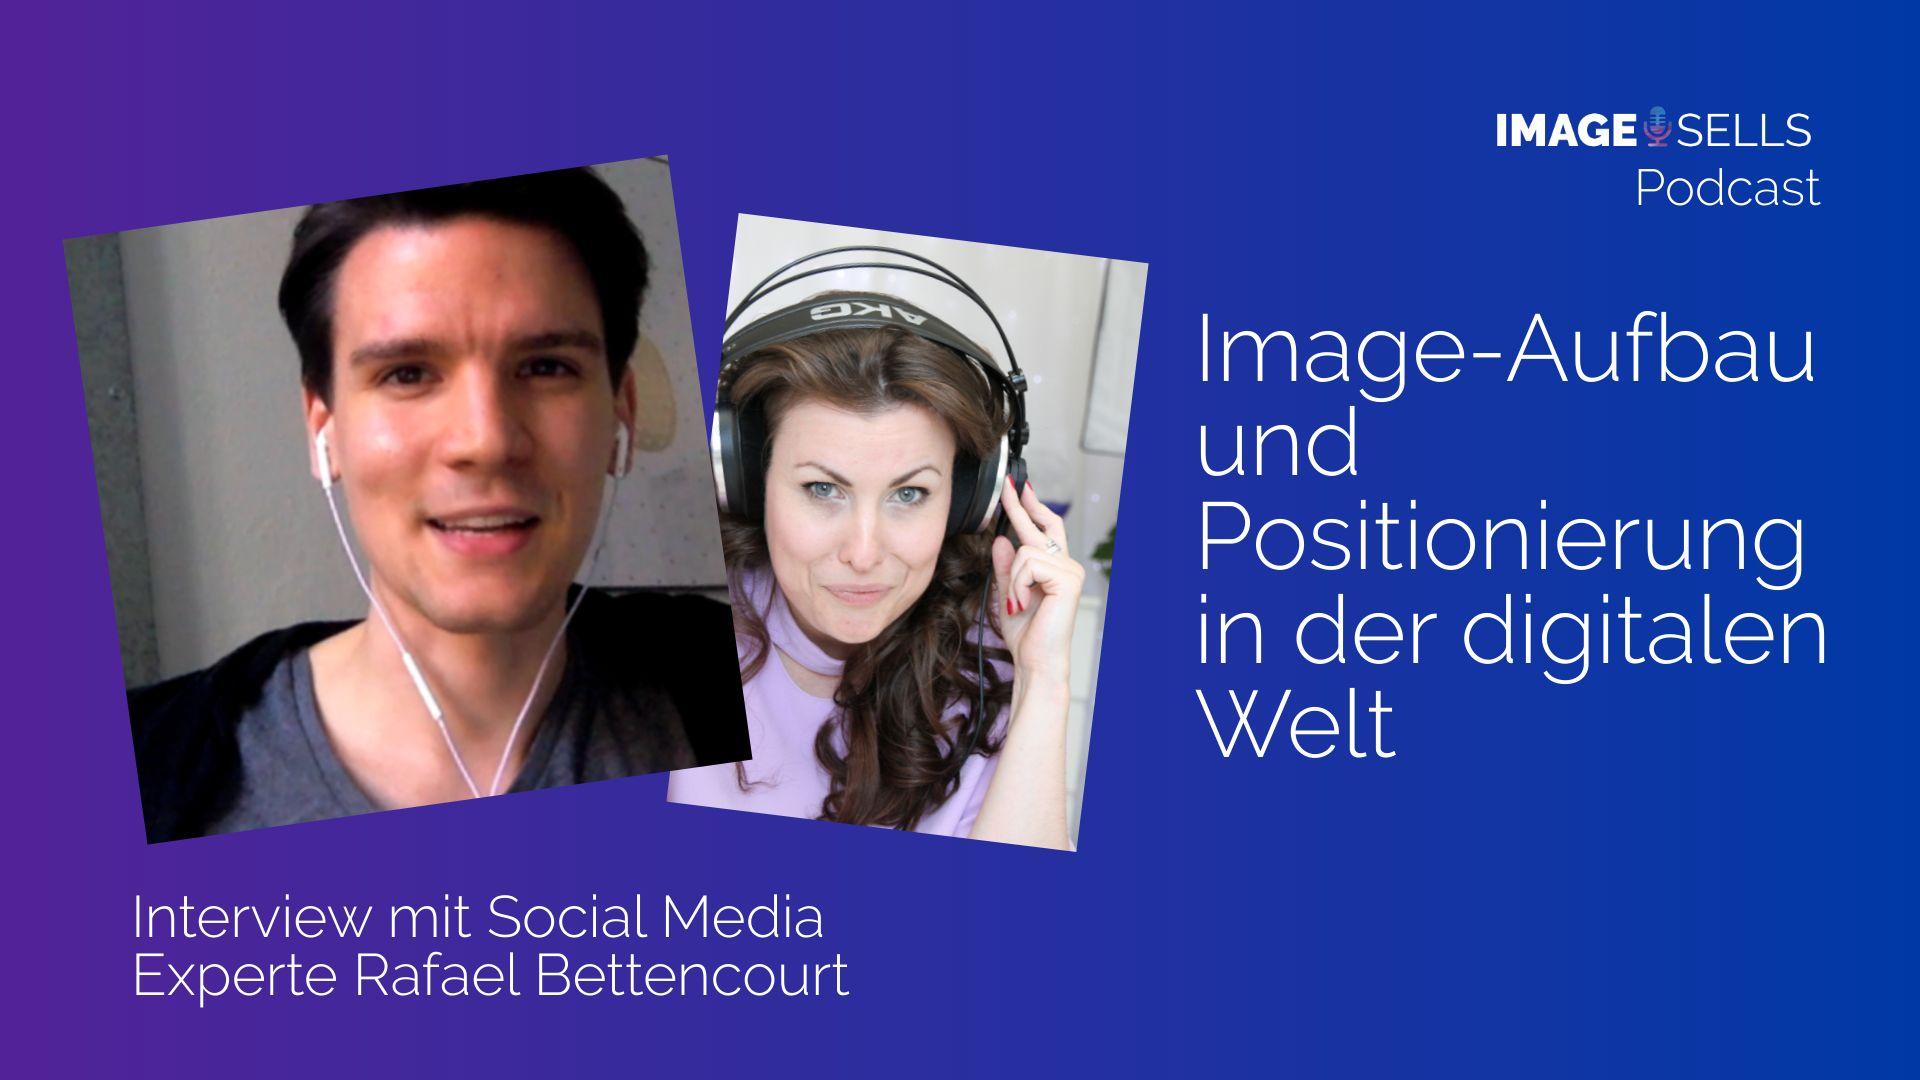 Image-Aufbau in der digitalen Welt mit social-media Experte Rafael Bettencourt – ISP #041